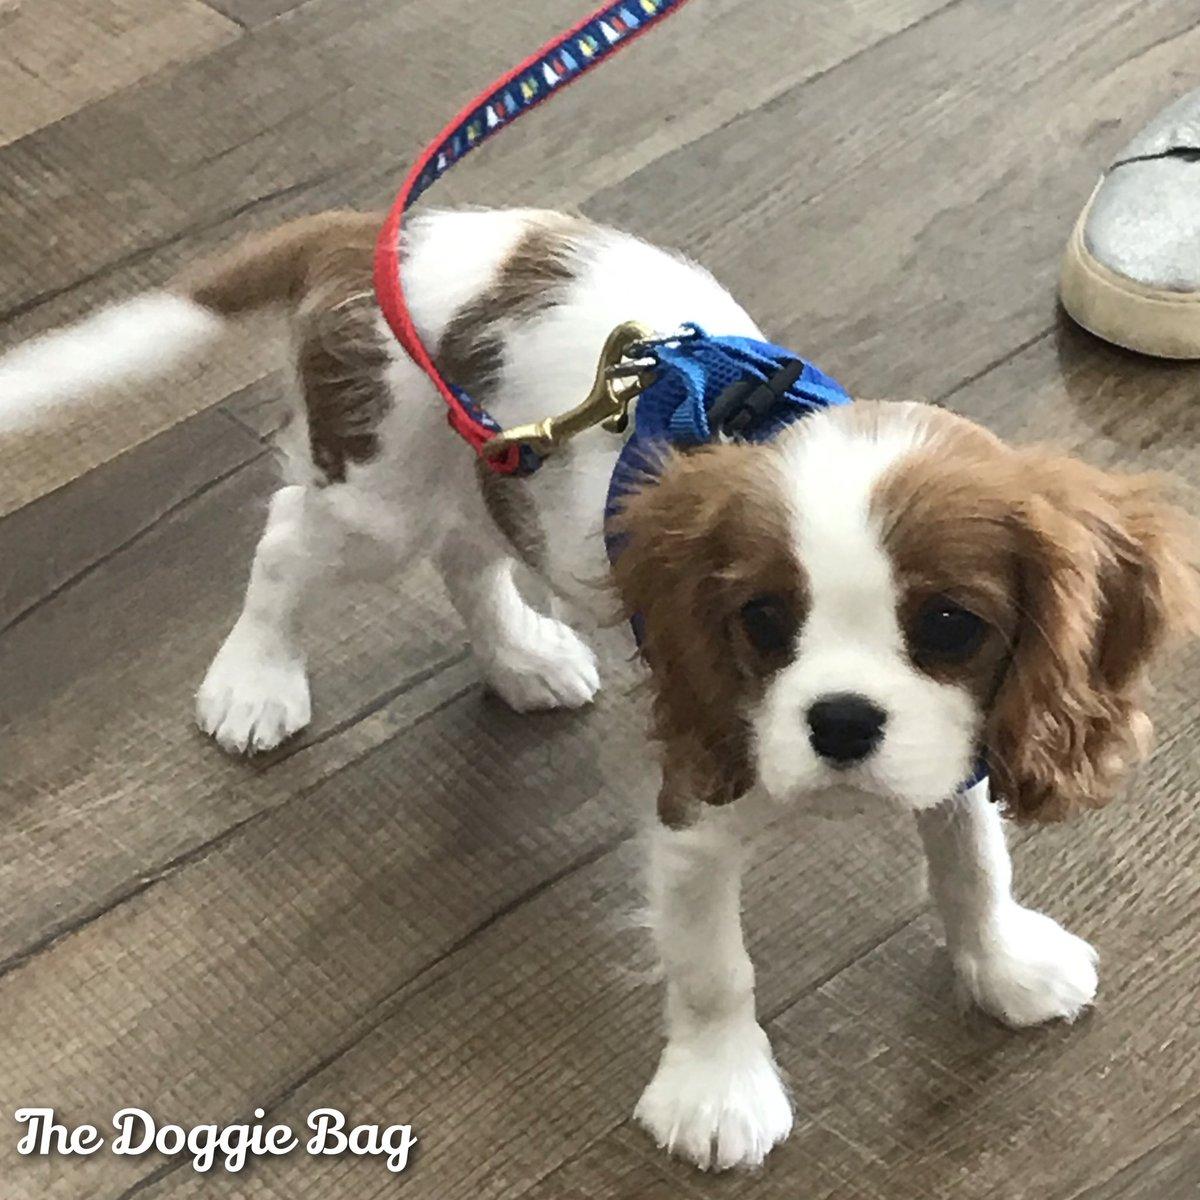 It's the Perfect Fit!🐾 Grady looks mighty handsome in his new #Harness & #Lead from #TheDoggieBag!💙  #cavalier #cavalierkingcharlesspaniel #puppylove #puppylife #doggiedesign #upcountrydog #dogsoflakeland #dogmomsoflkld #shoplakeland #petboutique #happyplace #lakelandflorida